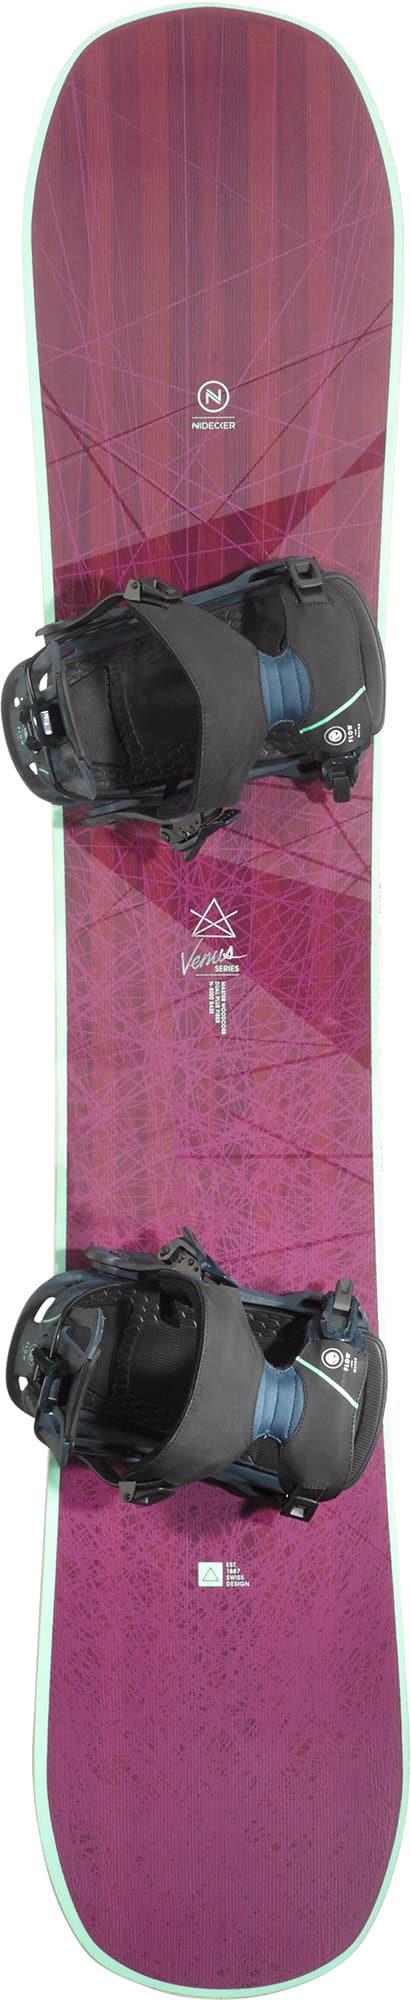 Nidecker Venus inkl. Flow Mayon Snowboard pour femme